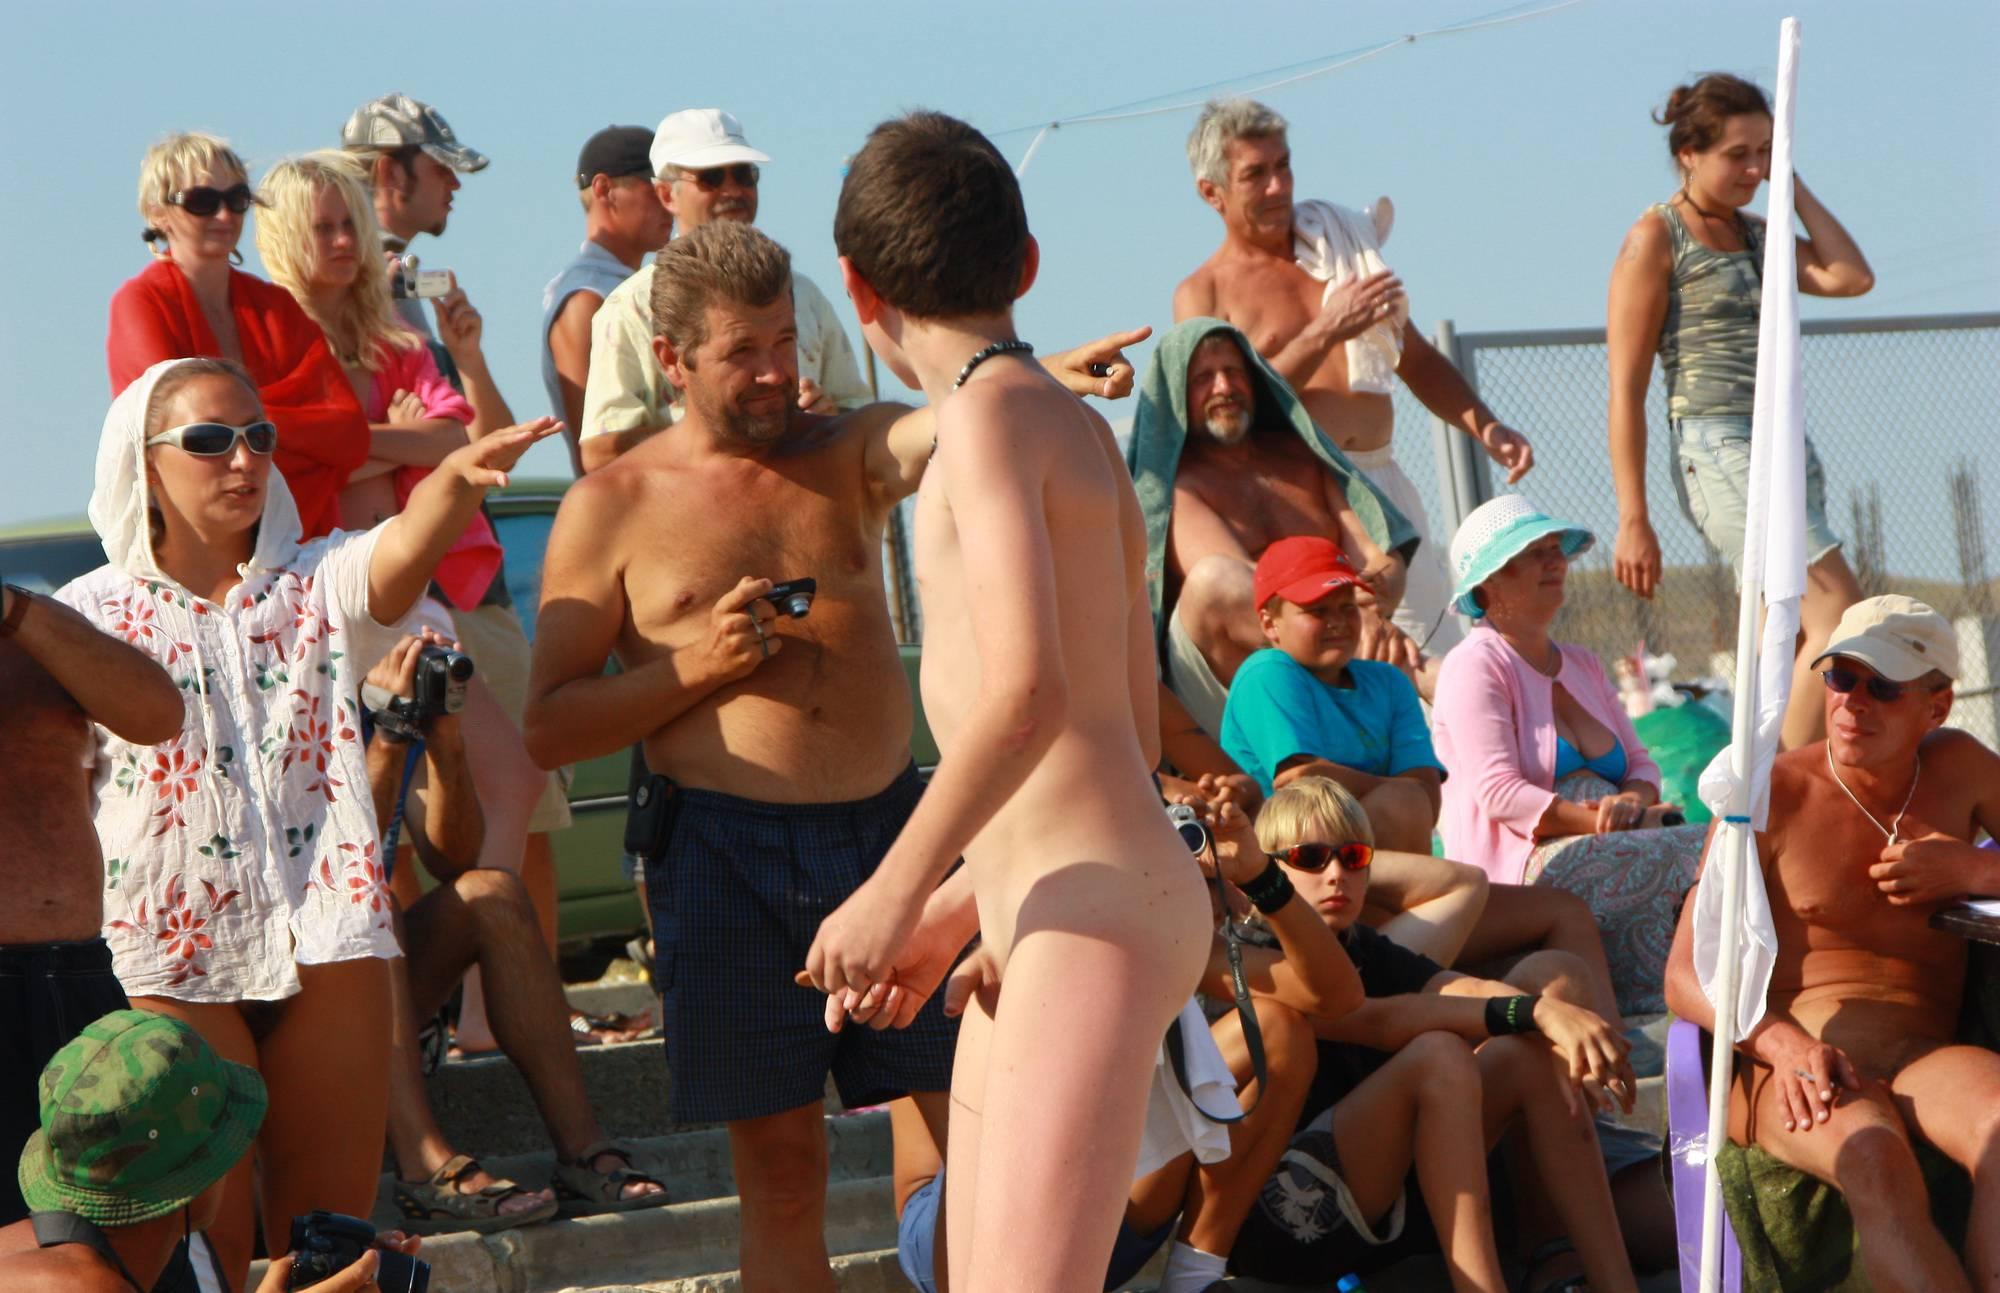 Nudist Pics Neptune Boy Gift Awards - 1